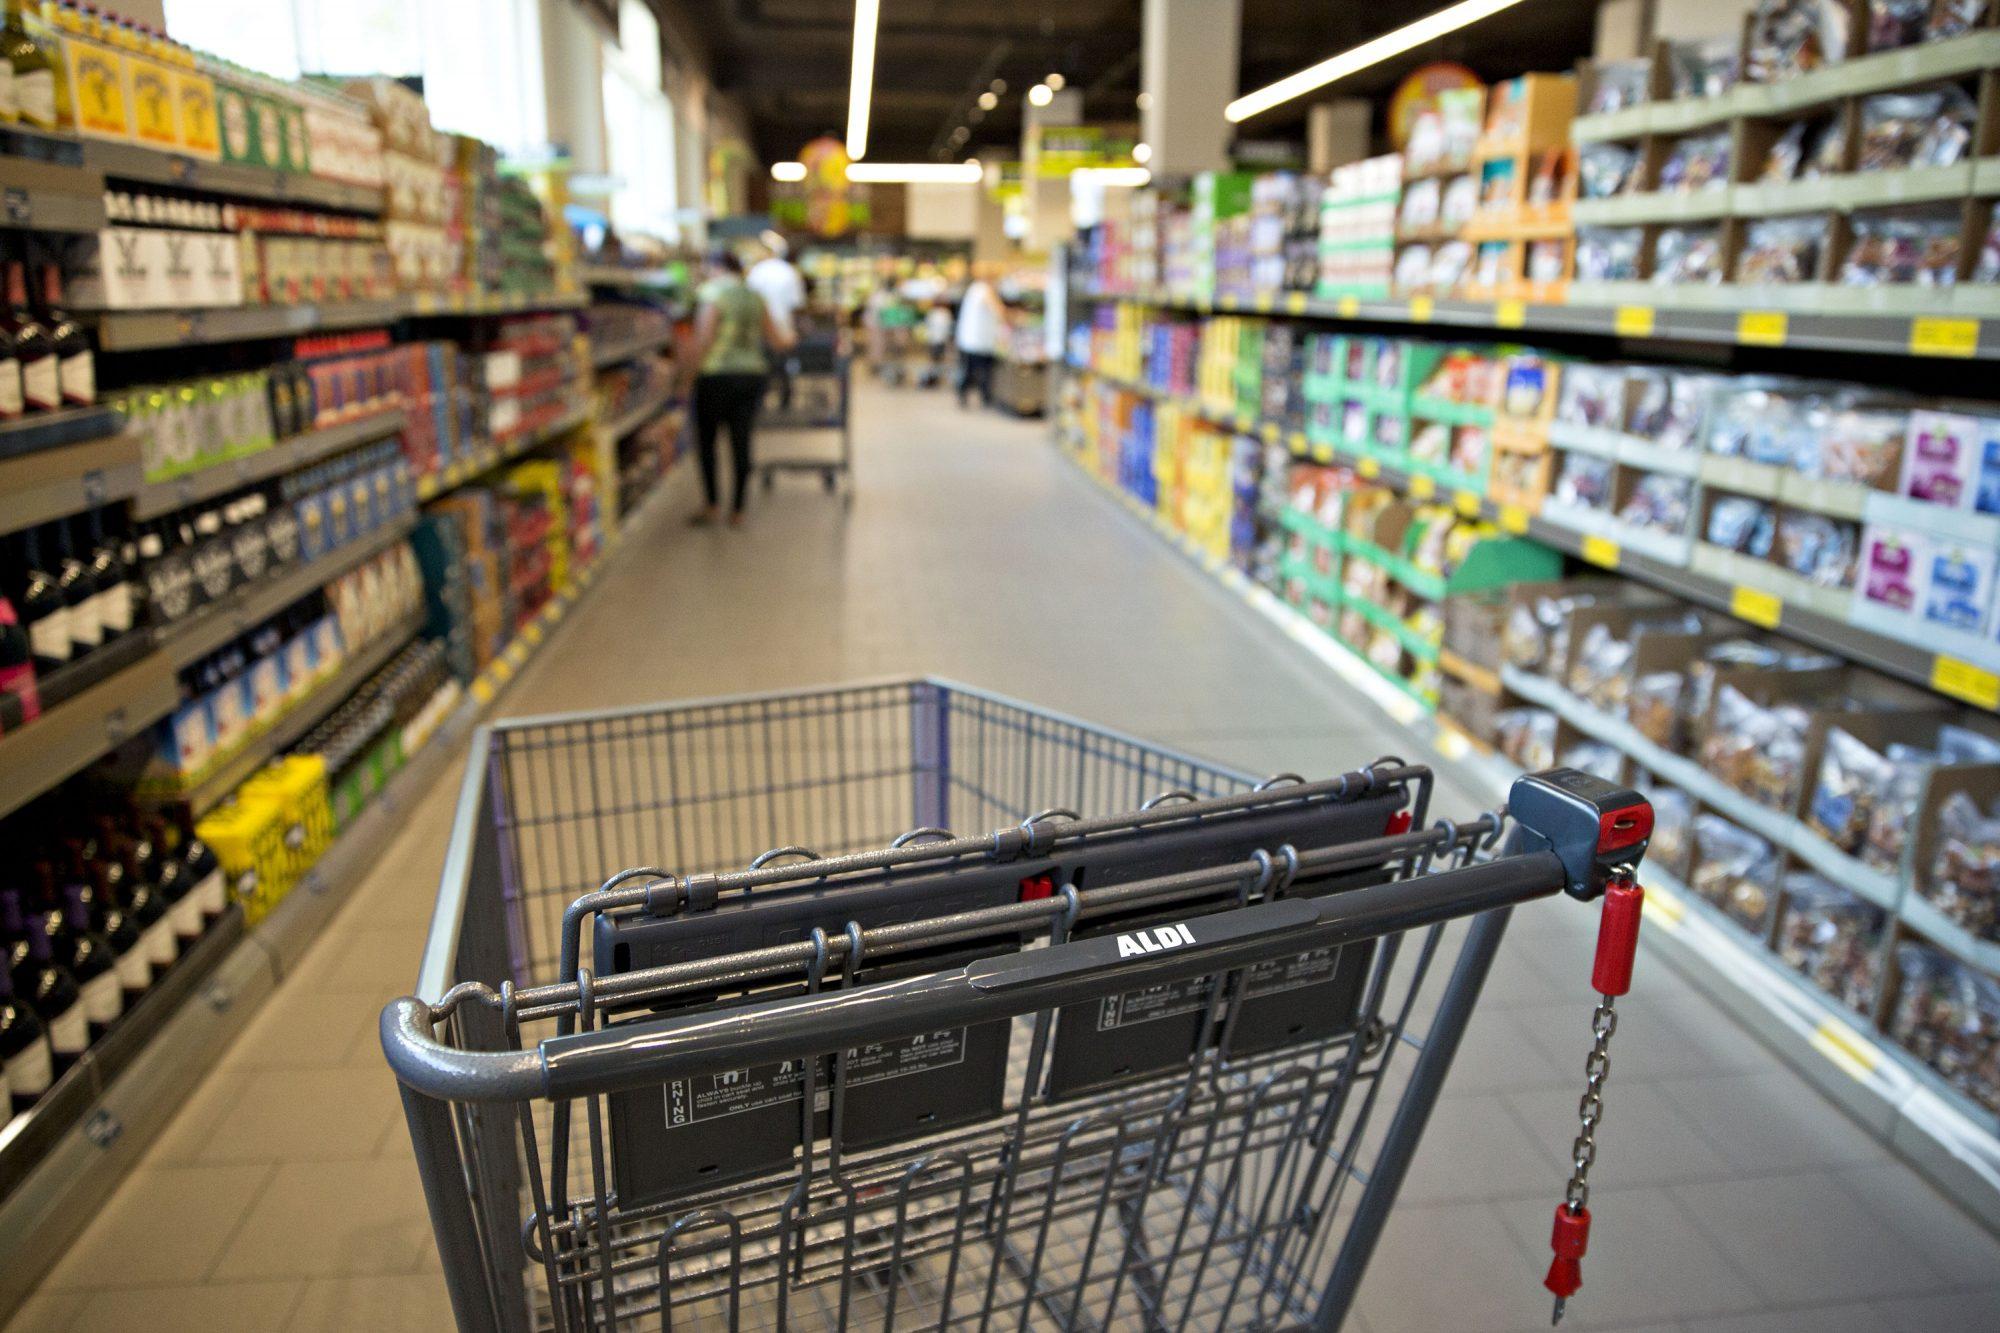 inside an aldi aisle with a shopping cart